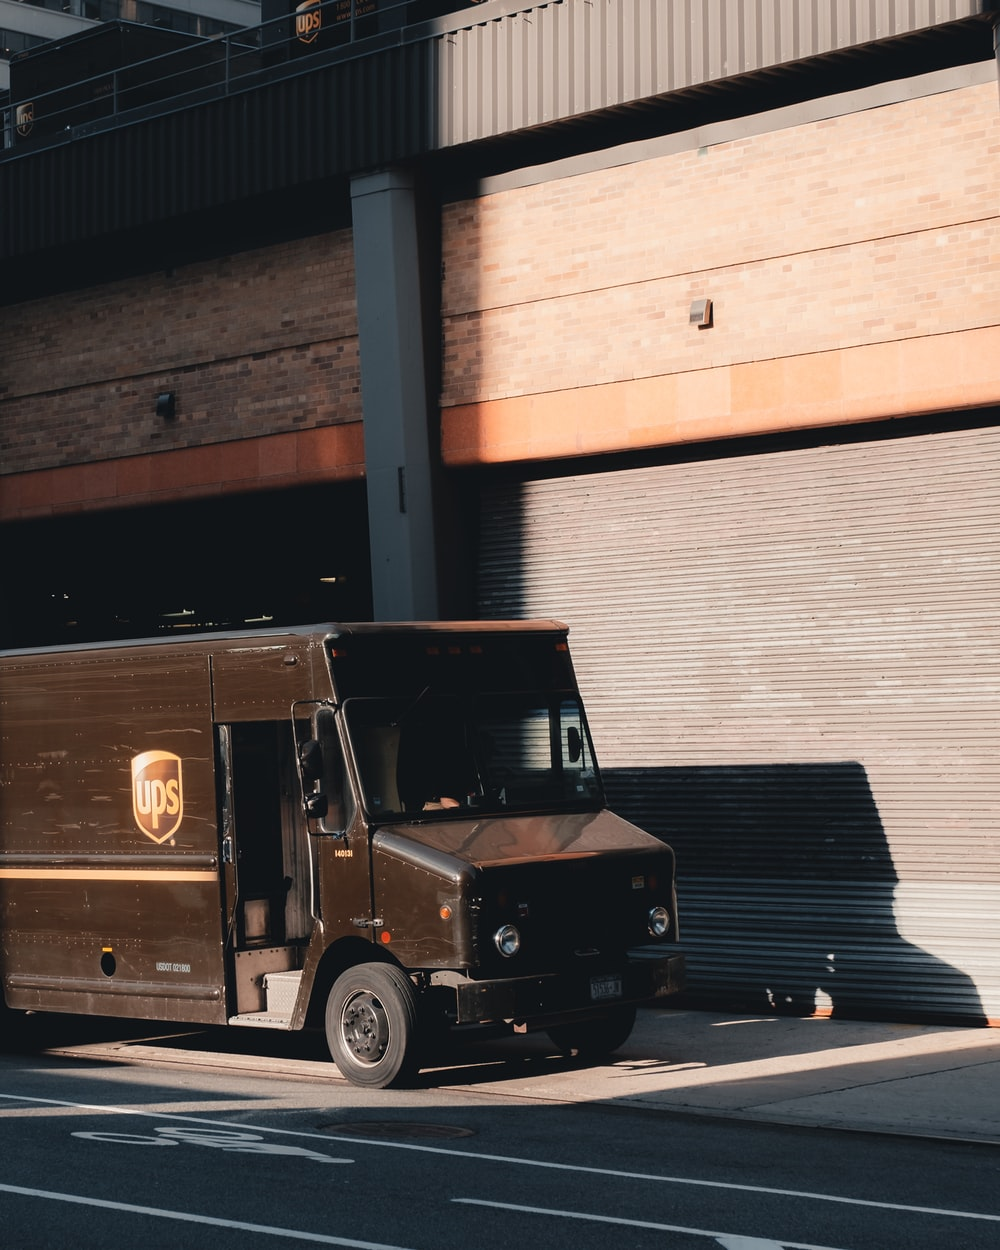 black van parked near near building